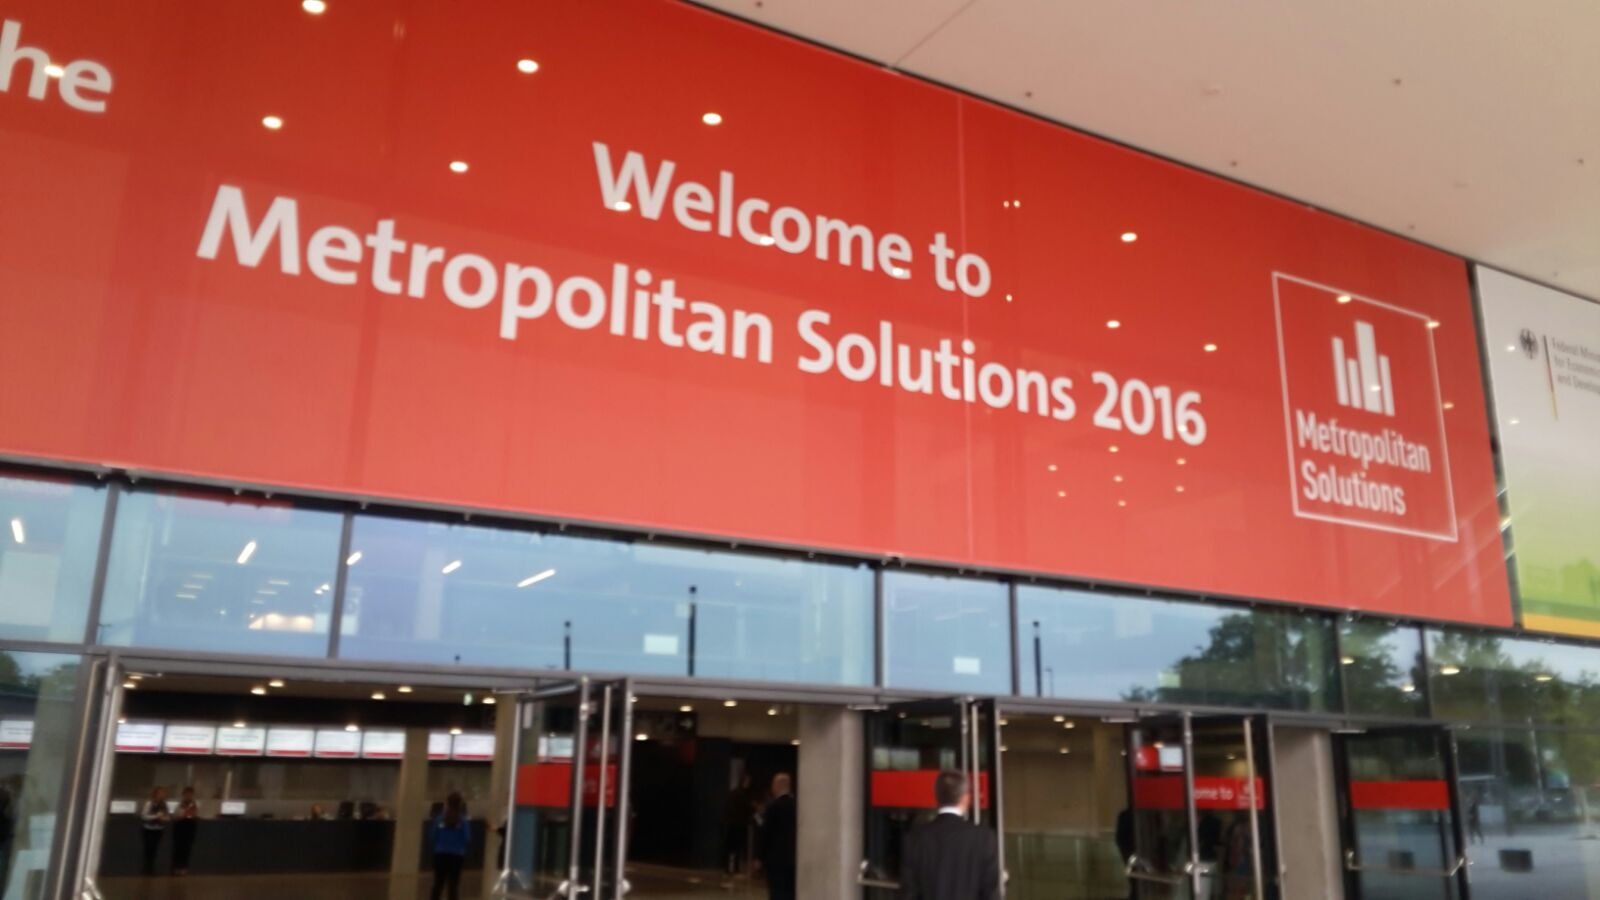 Metropolitan Solutions